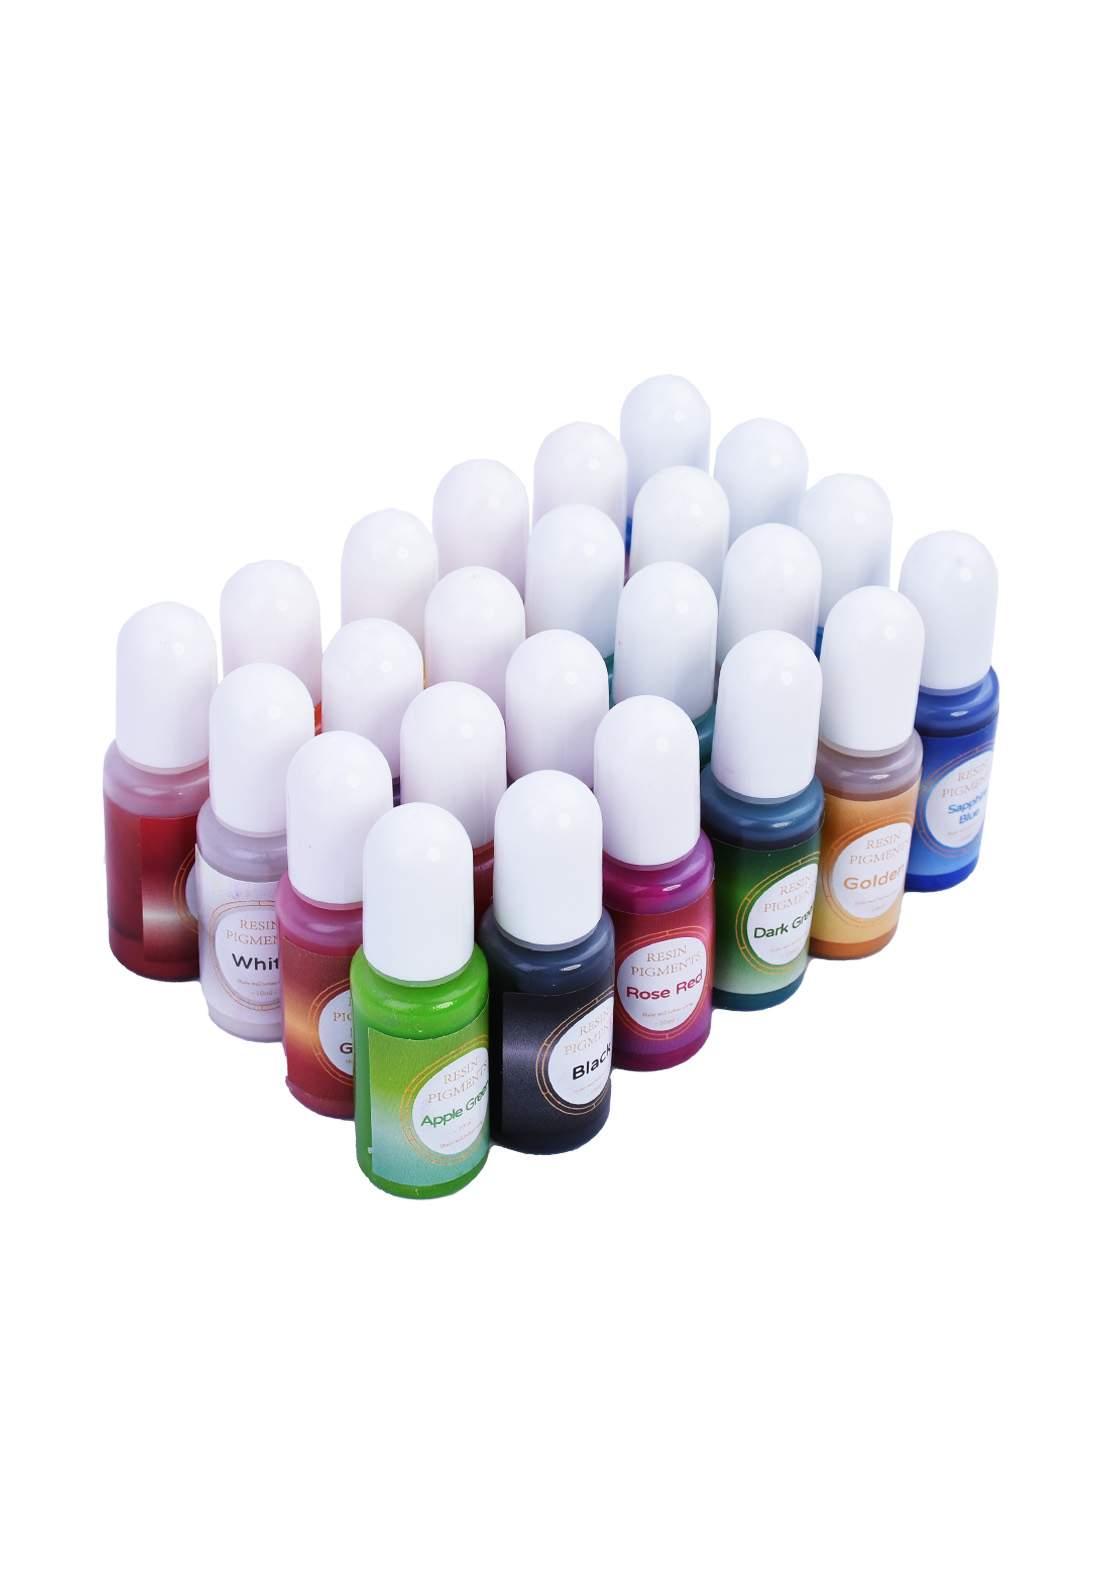 Epoxy Resin Pigment 24 color سيت اصباغ ايبوكسي